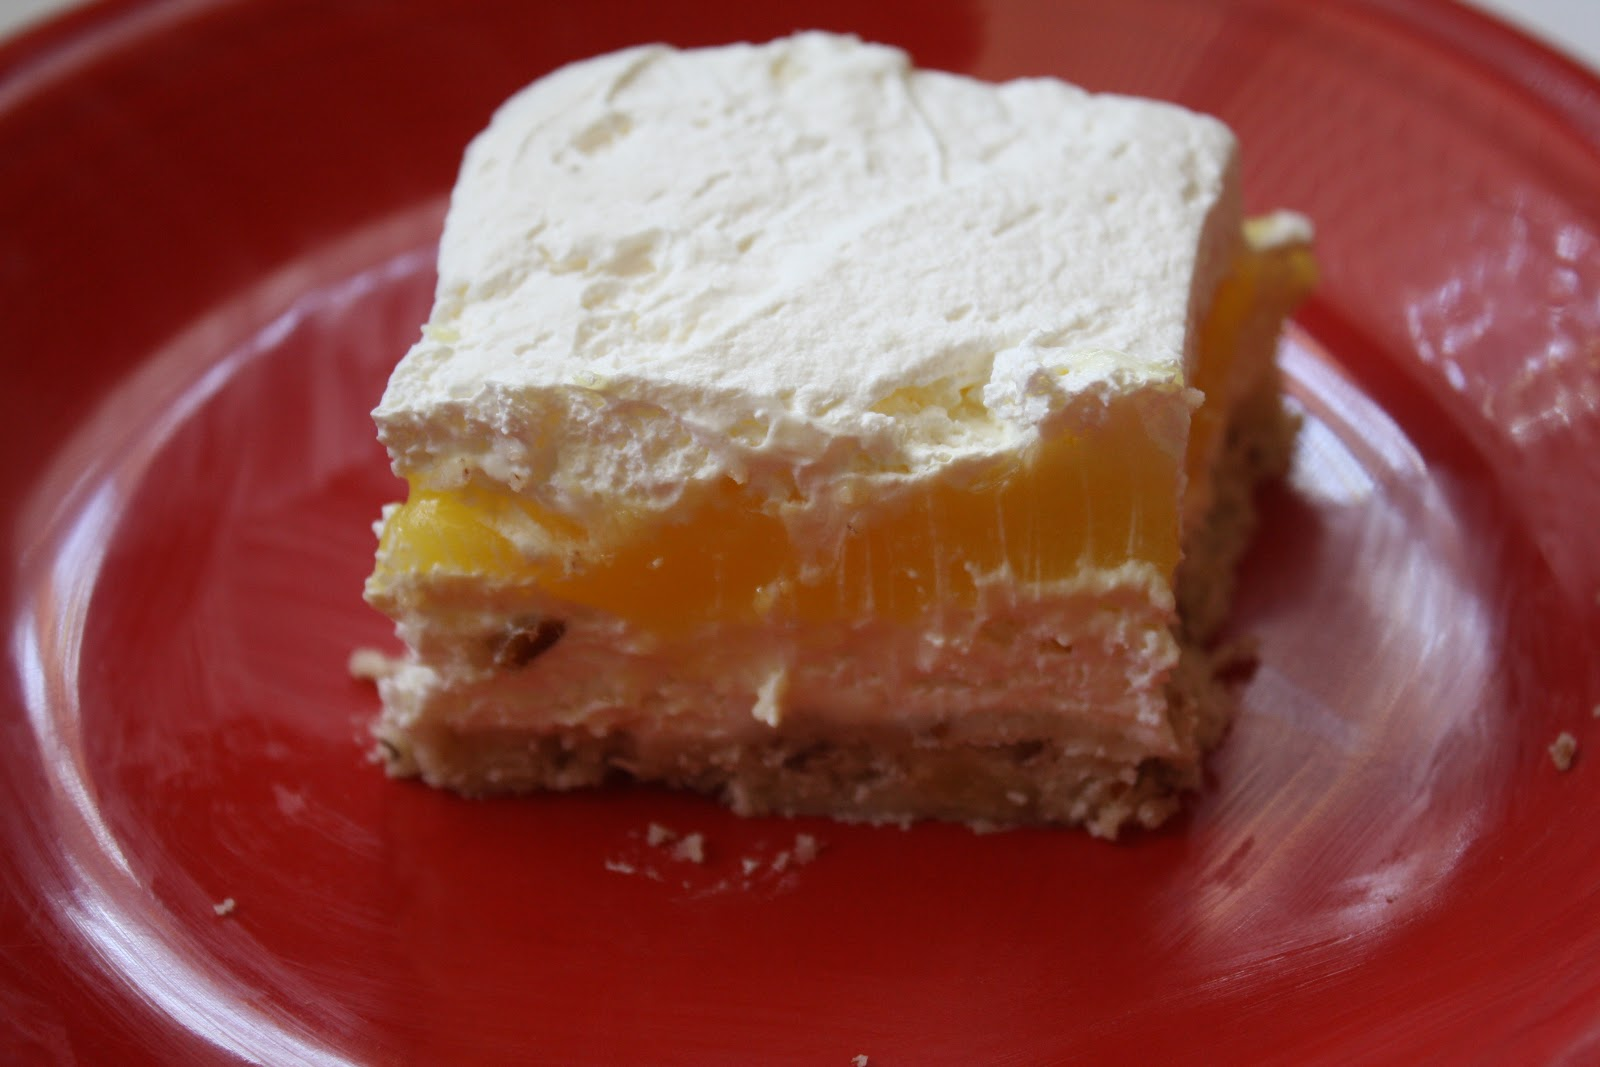 lemon dessert with cream cheese